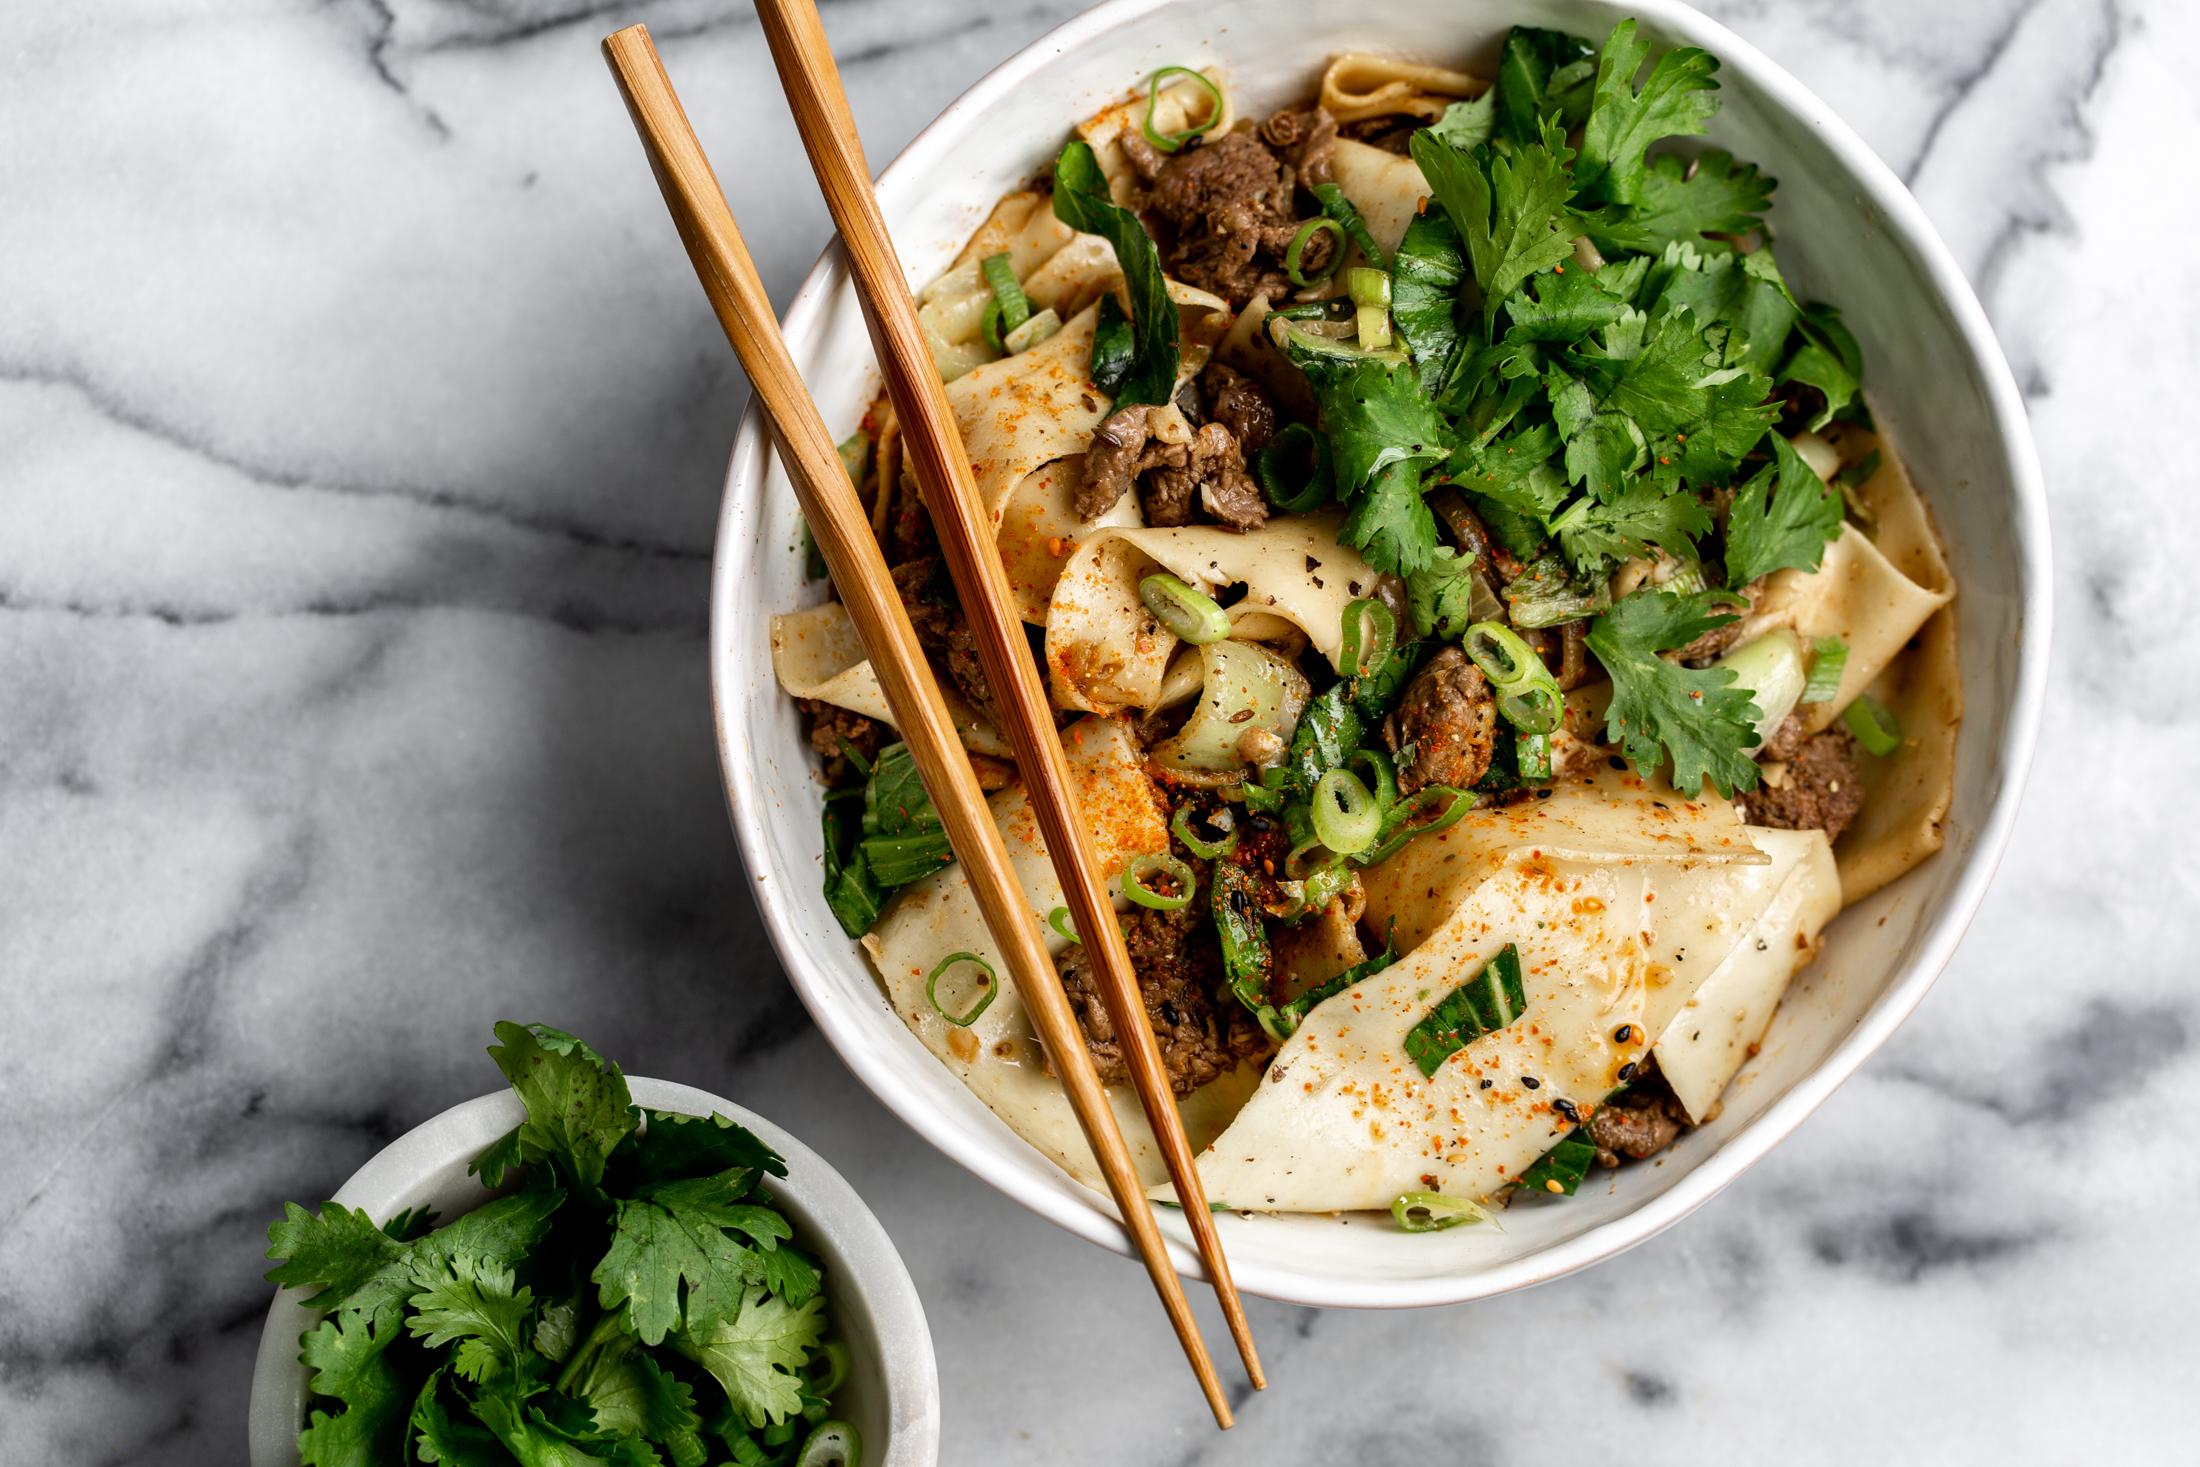 Sichuan-Style Spicy Cumin Lamb Noodles-25.jpg